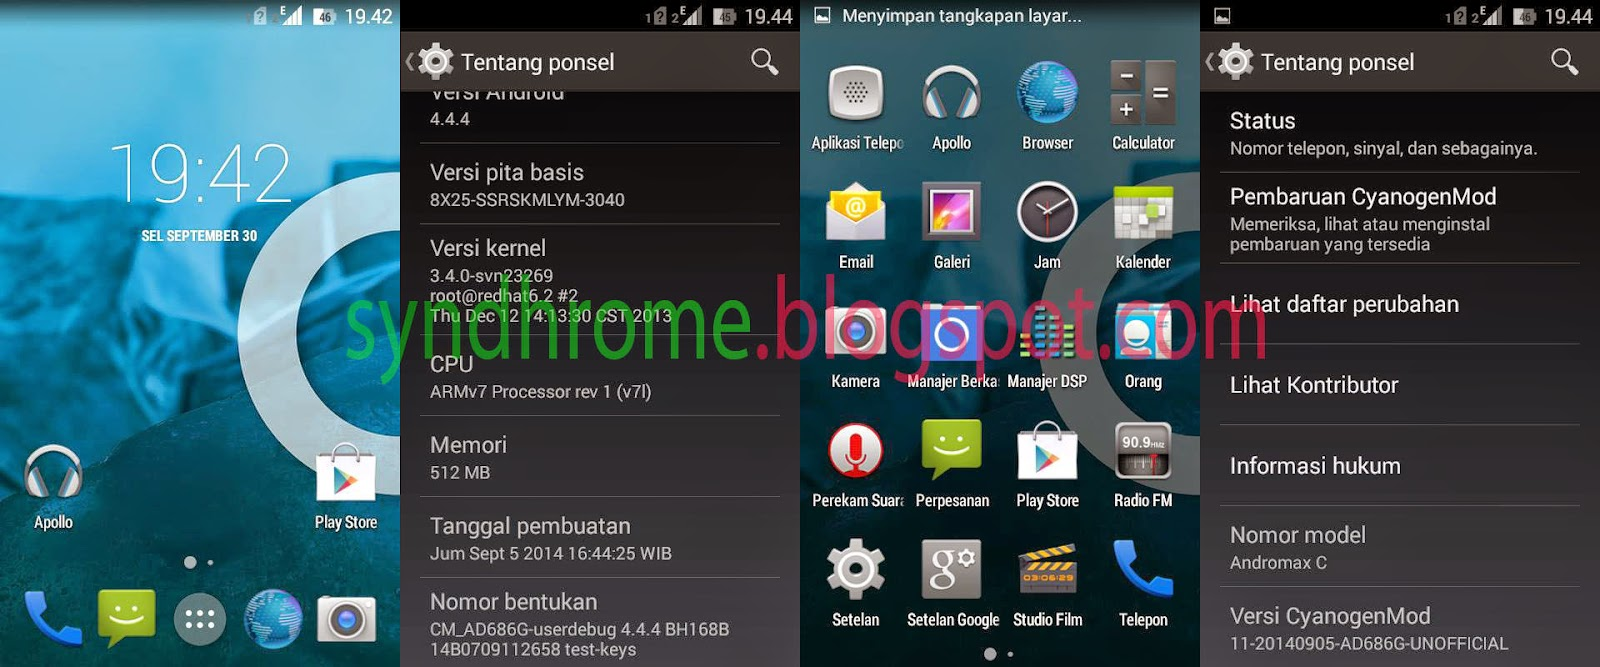 Install ROM Cyanogenmod 11 di Smartfren Andromax C Taerbaru   ROM Paling Fenomenal!